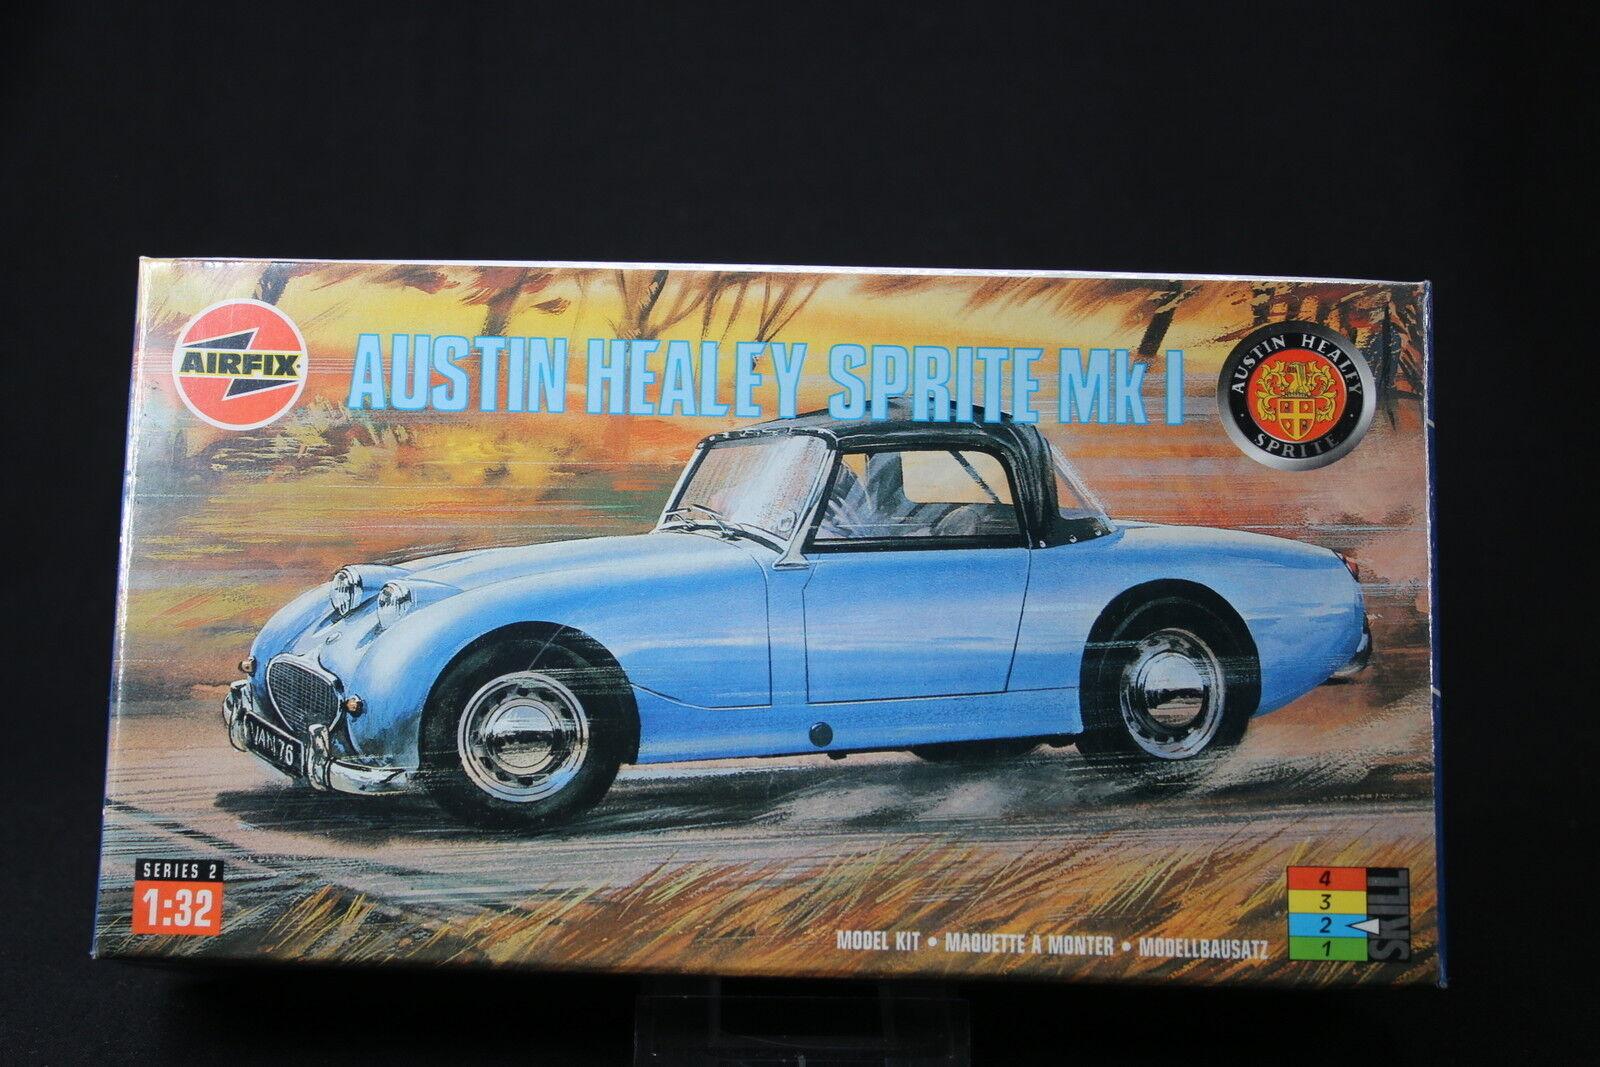 nueva gama alta exclusiva XL264 AIRFIX 1 32 maquette voiture 02421 02421 02421 Austin Healey Sprite Mk1 NB 1997  envio rapido a ti